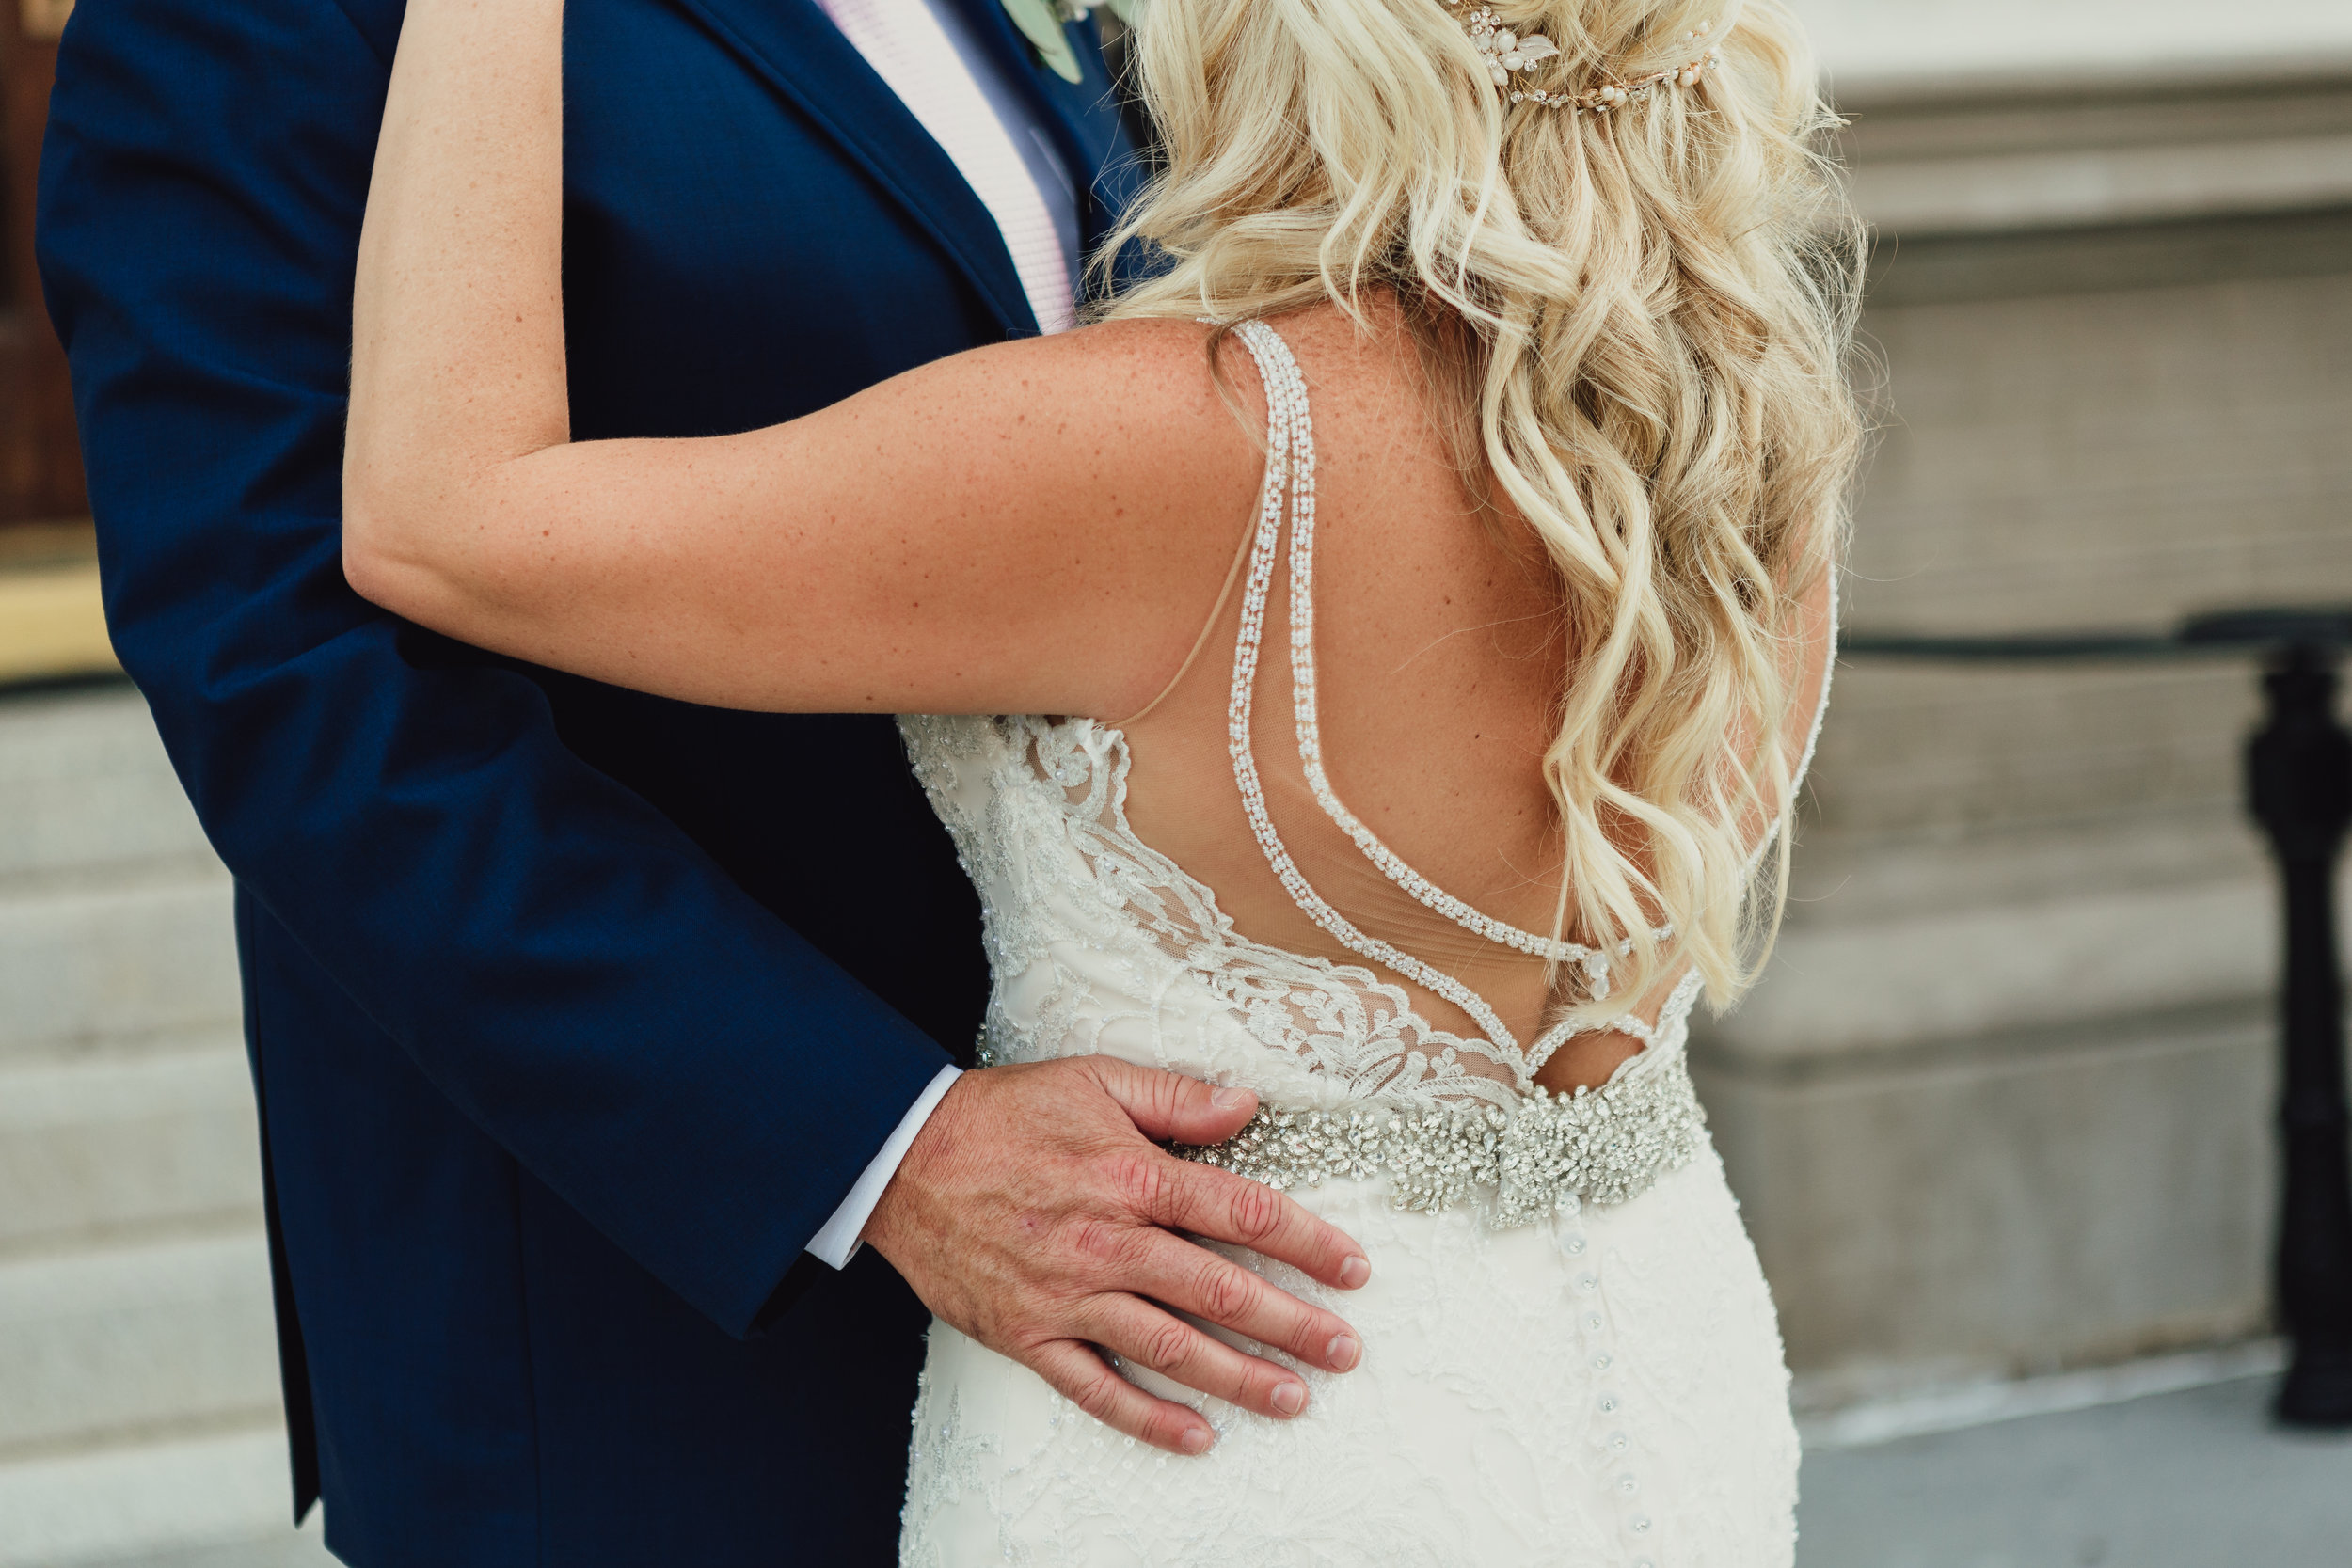 east-tn-wedding-photographer-tennessee-elopement-photographer-kingsport-tn-wedding-photographer (422 of 1001).jpg